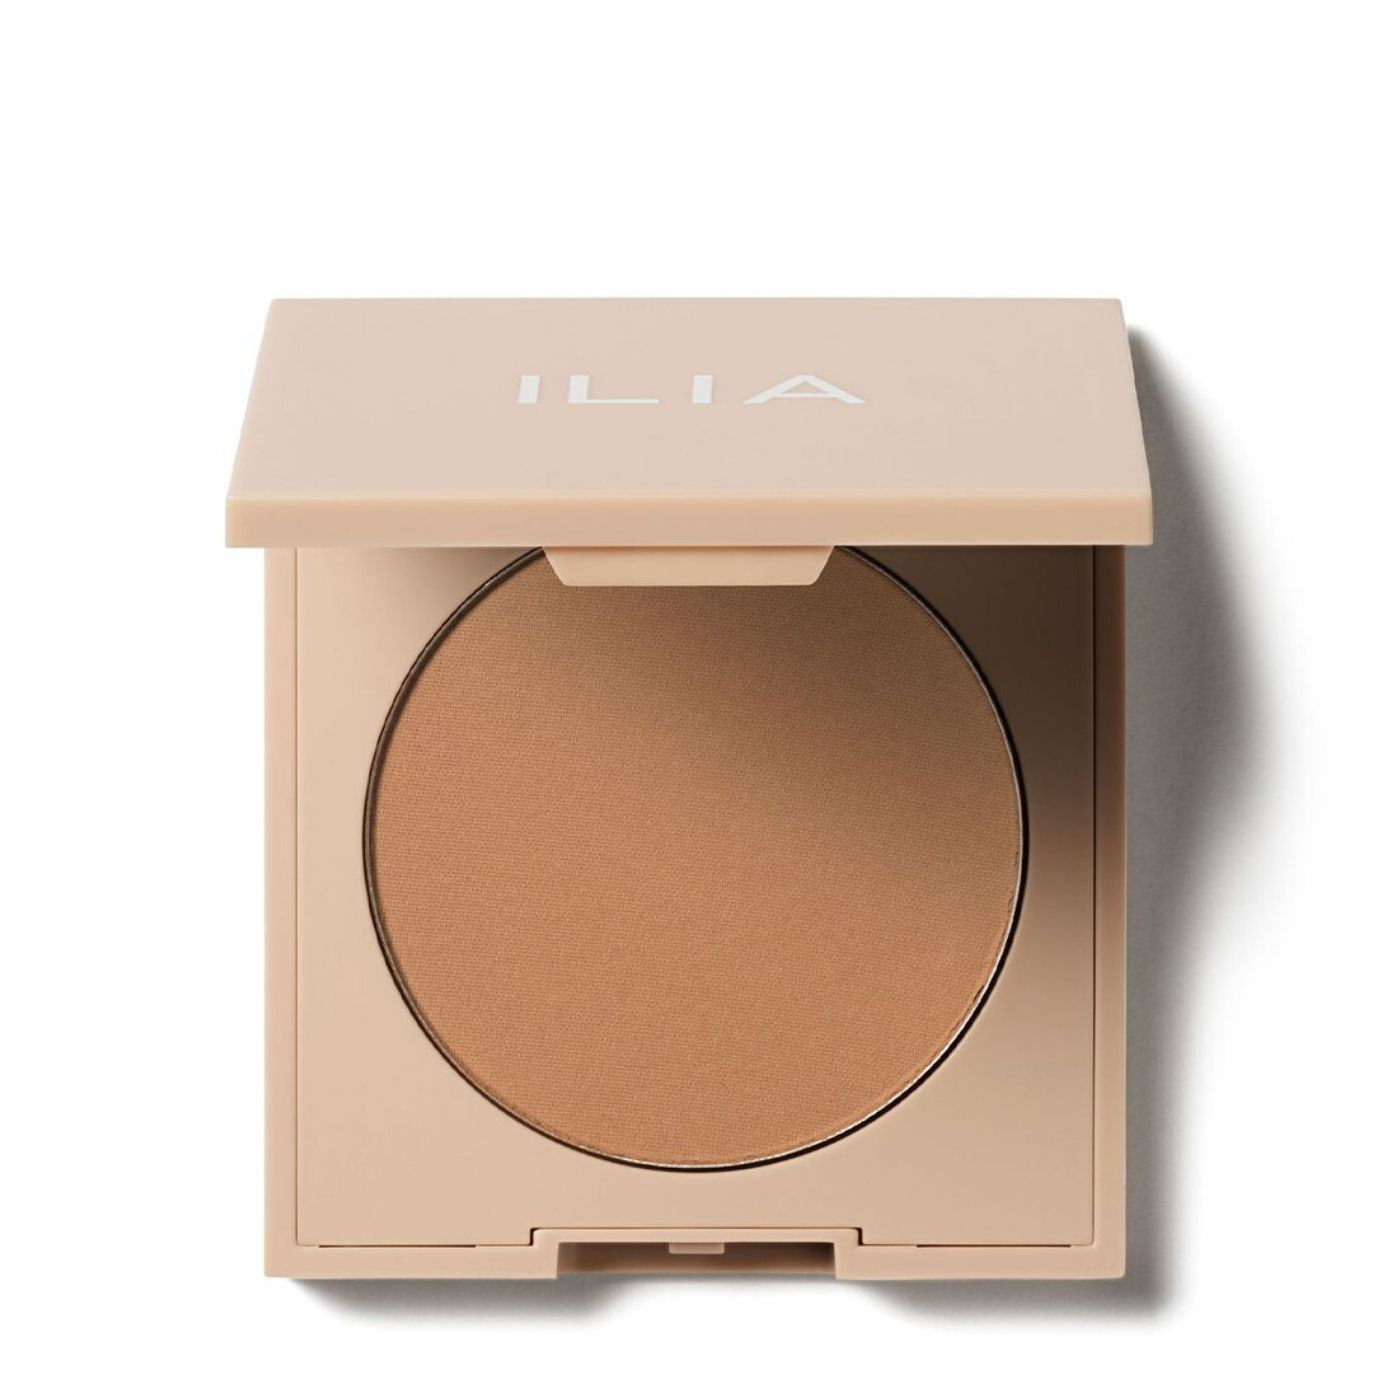 ILIA BEAUTY Bronzer NightLite 2 | SoBio Beauty Boutique 2